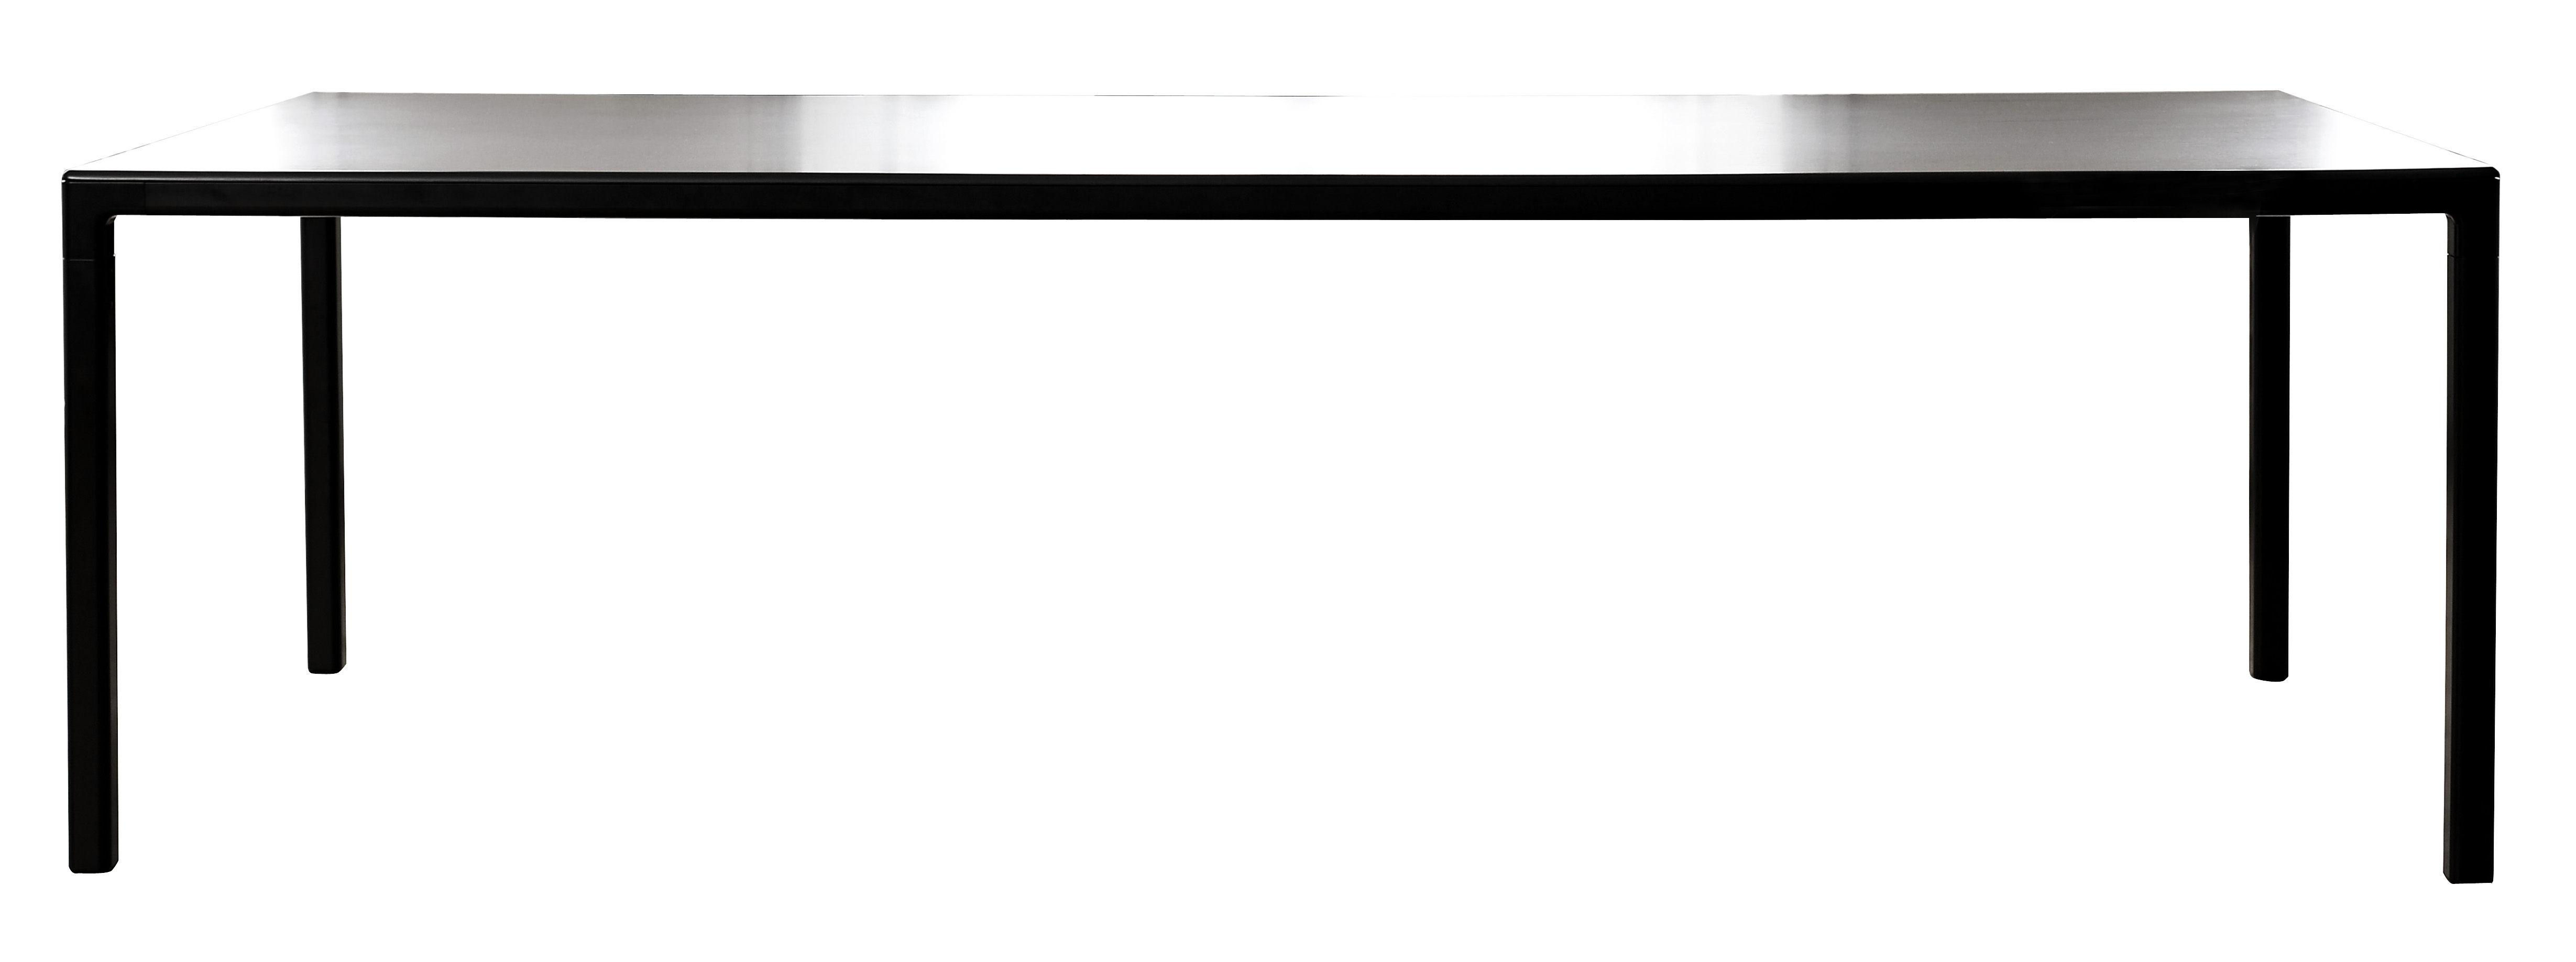 Möbel - Tische - T12 Tisch rechteckig - 160 x 80 cm - Hay - 160 x 80 cm - schwarz - bemaltes Aluminium, Linoleum